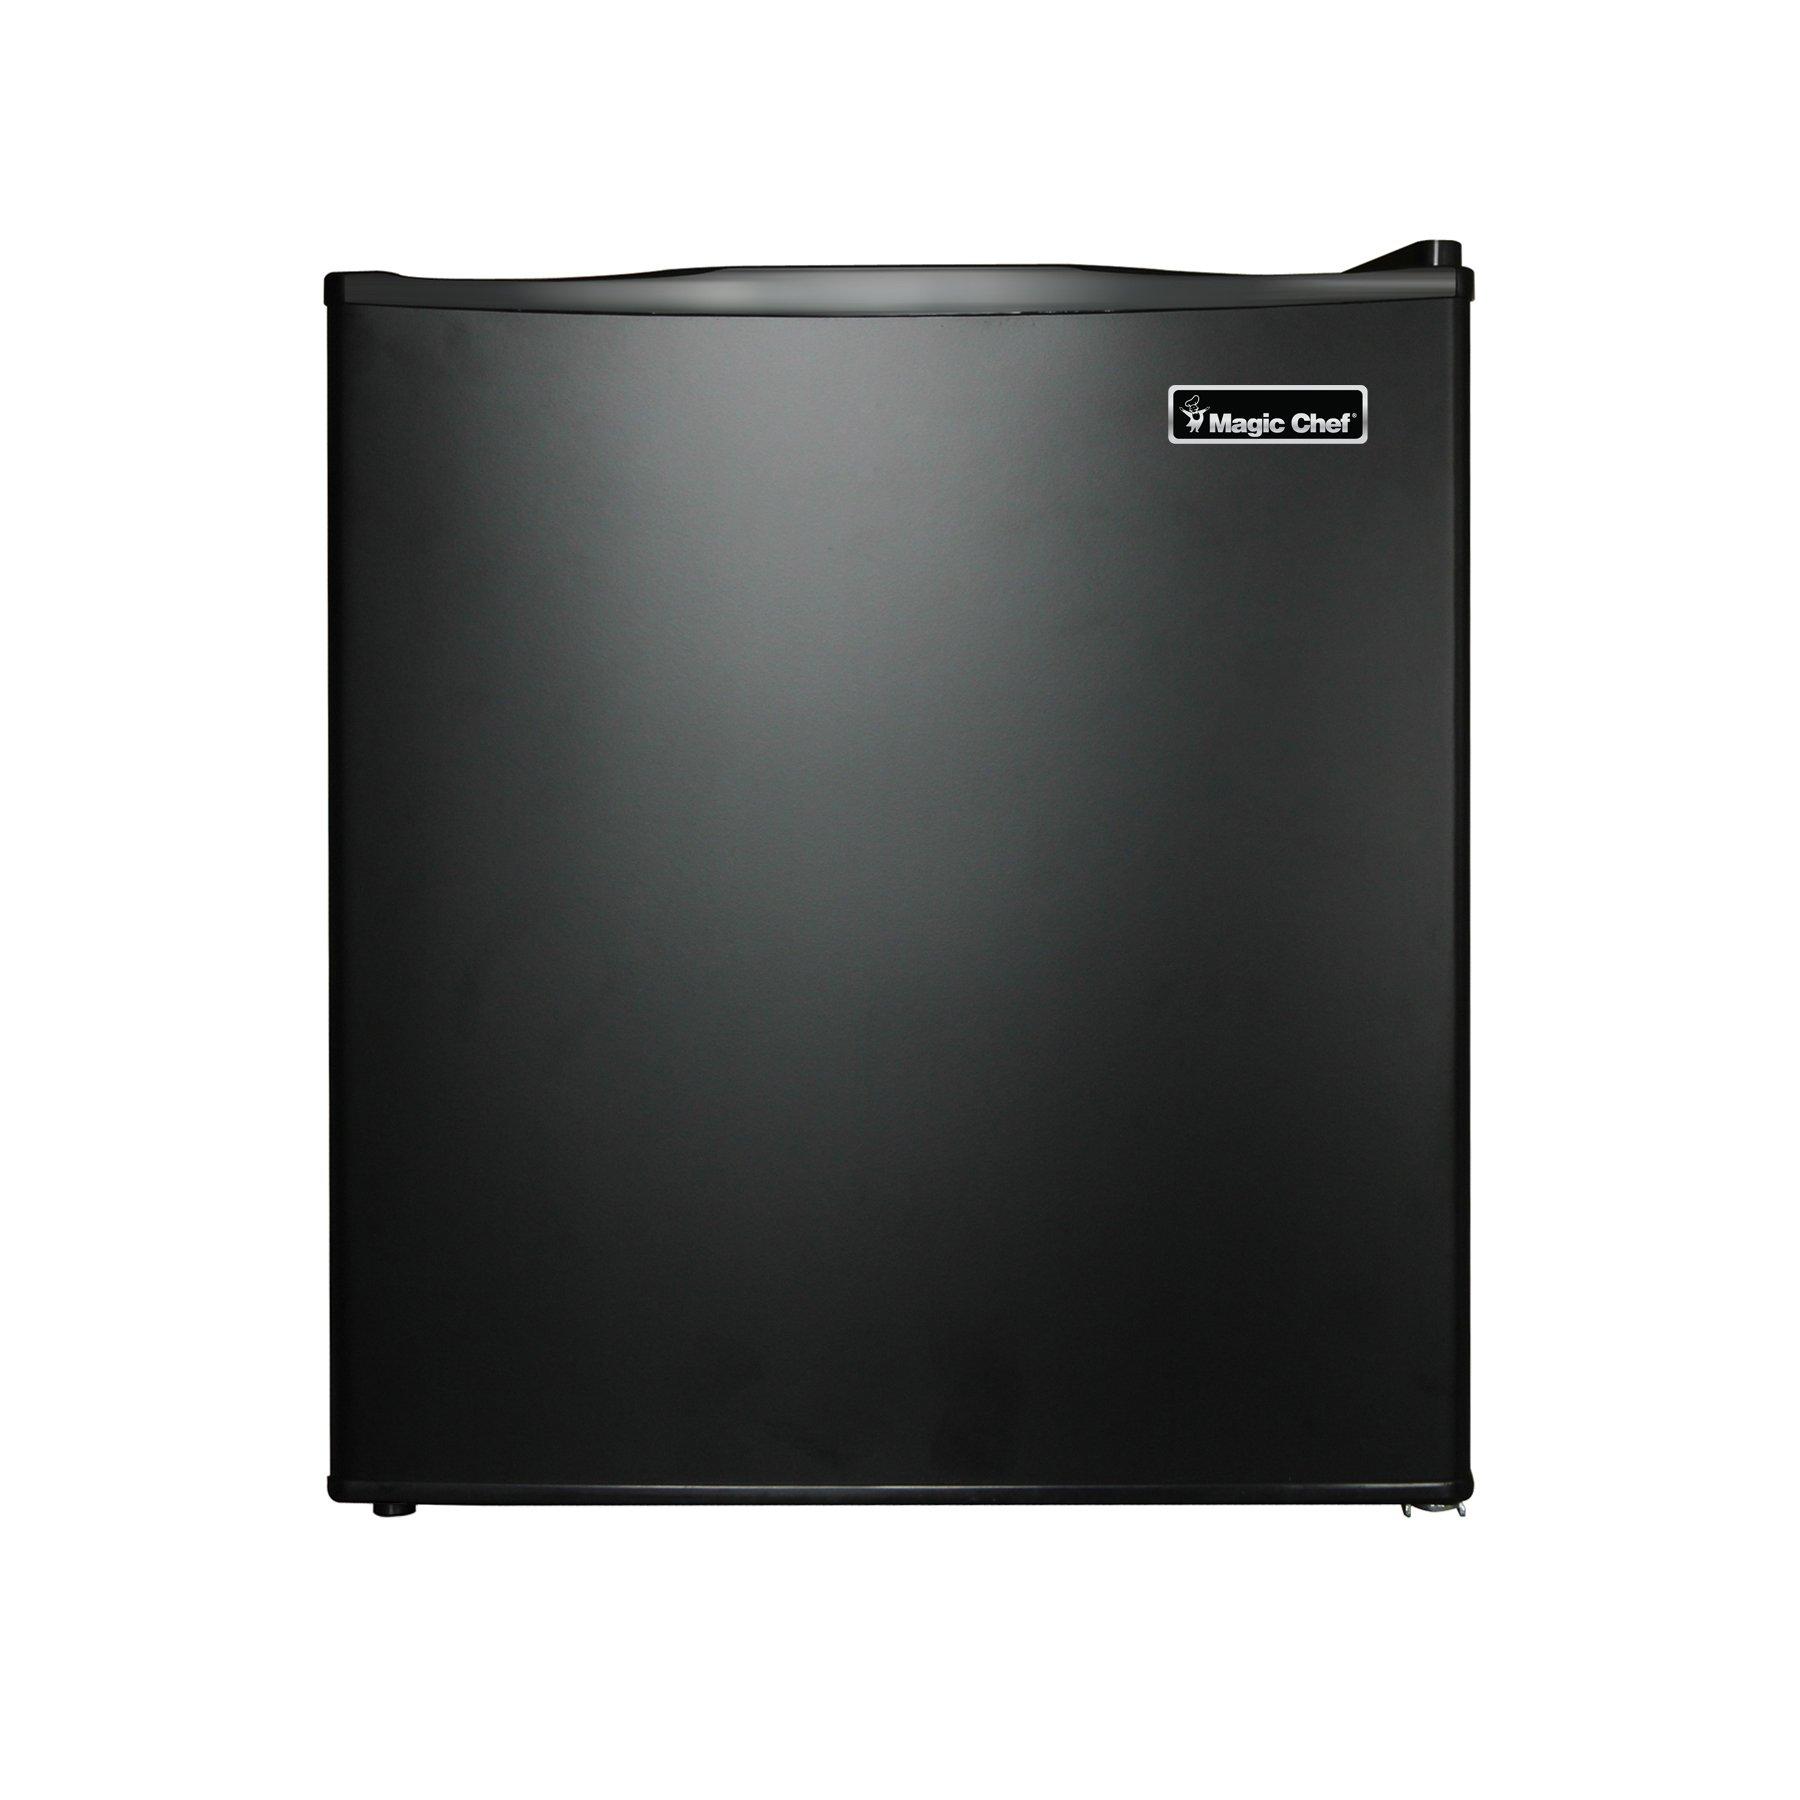 Magic Chef MCAR170B2 1.7 cu.ft. All Refrigerator, Black